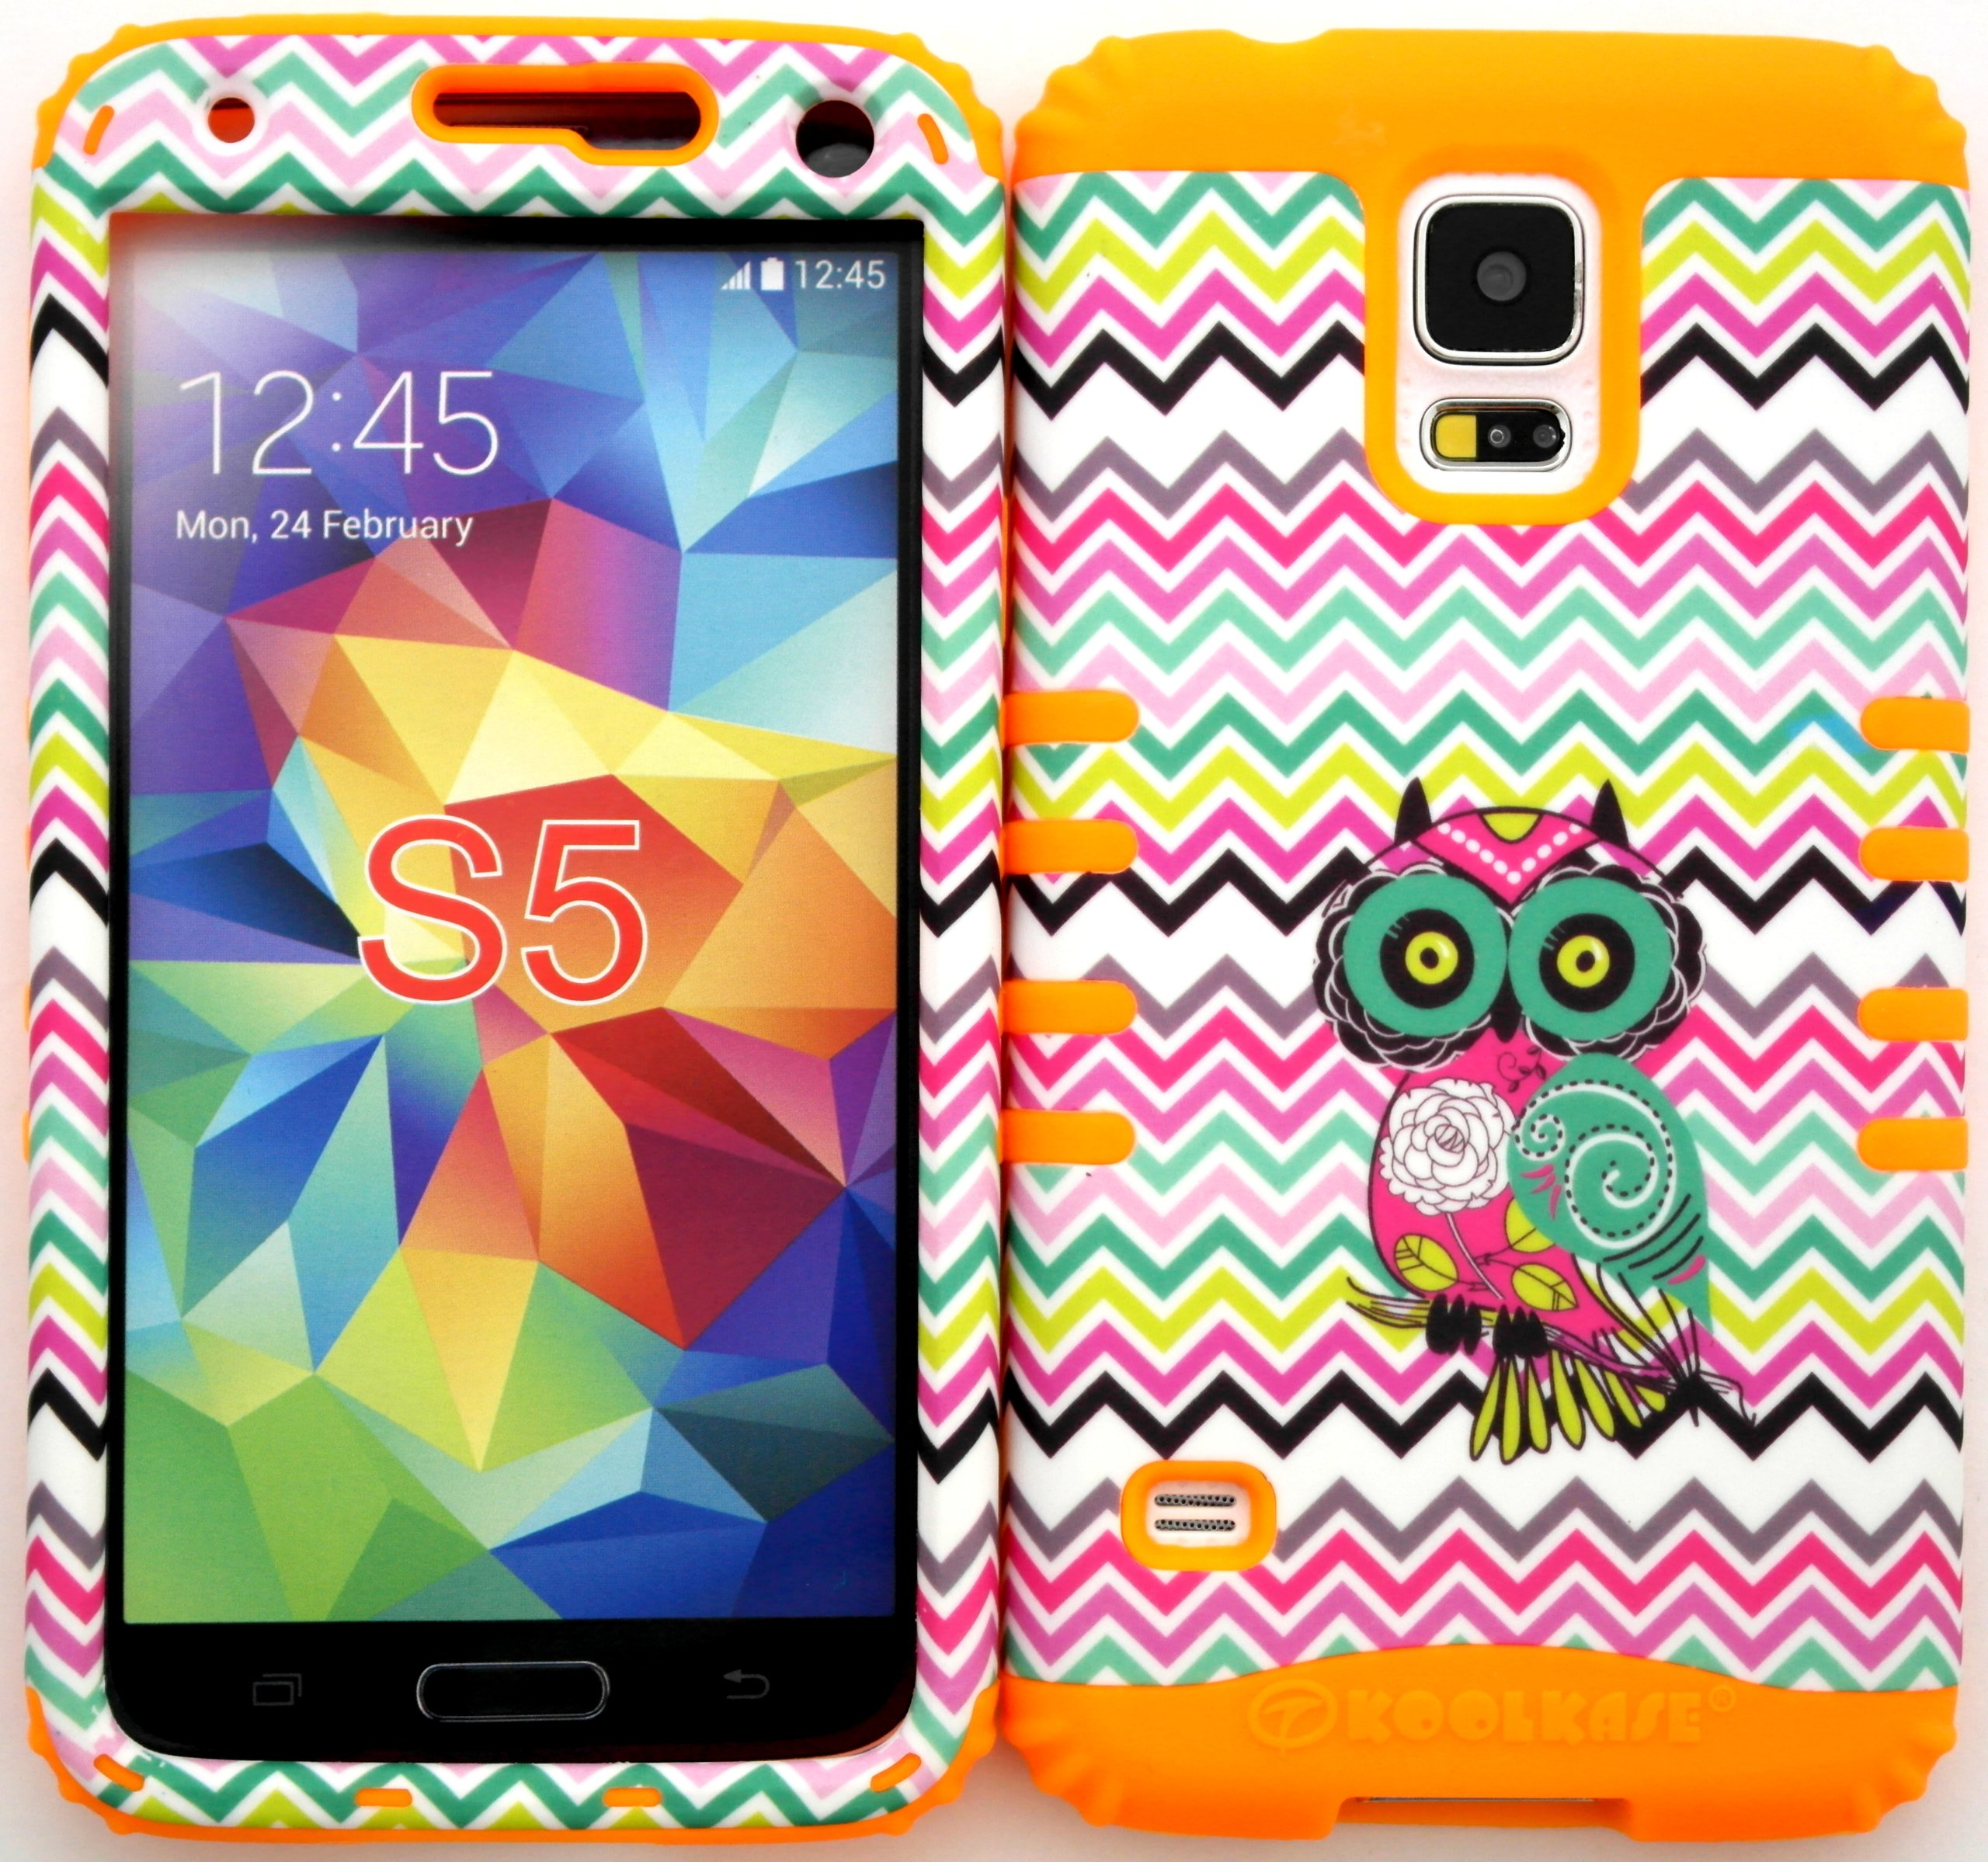 Wireless Fones TM Samsung Galaxy S5 Case Dual Layer